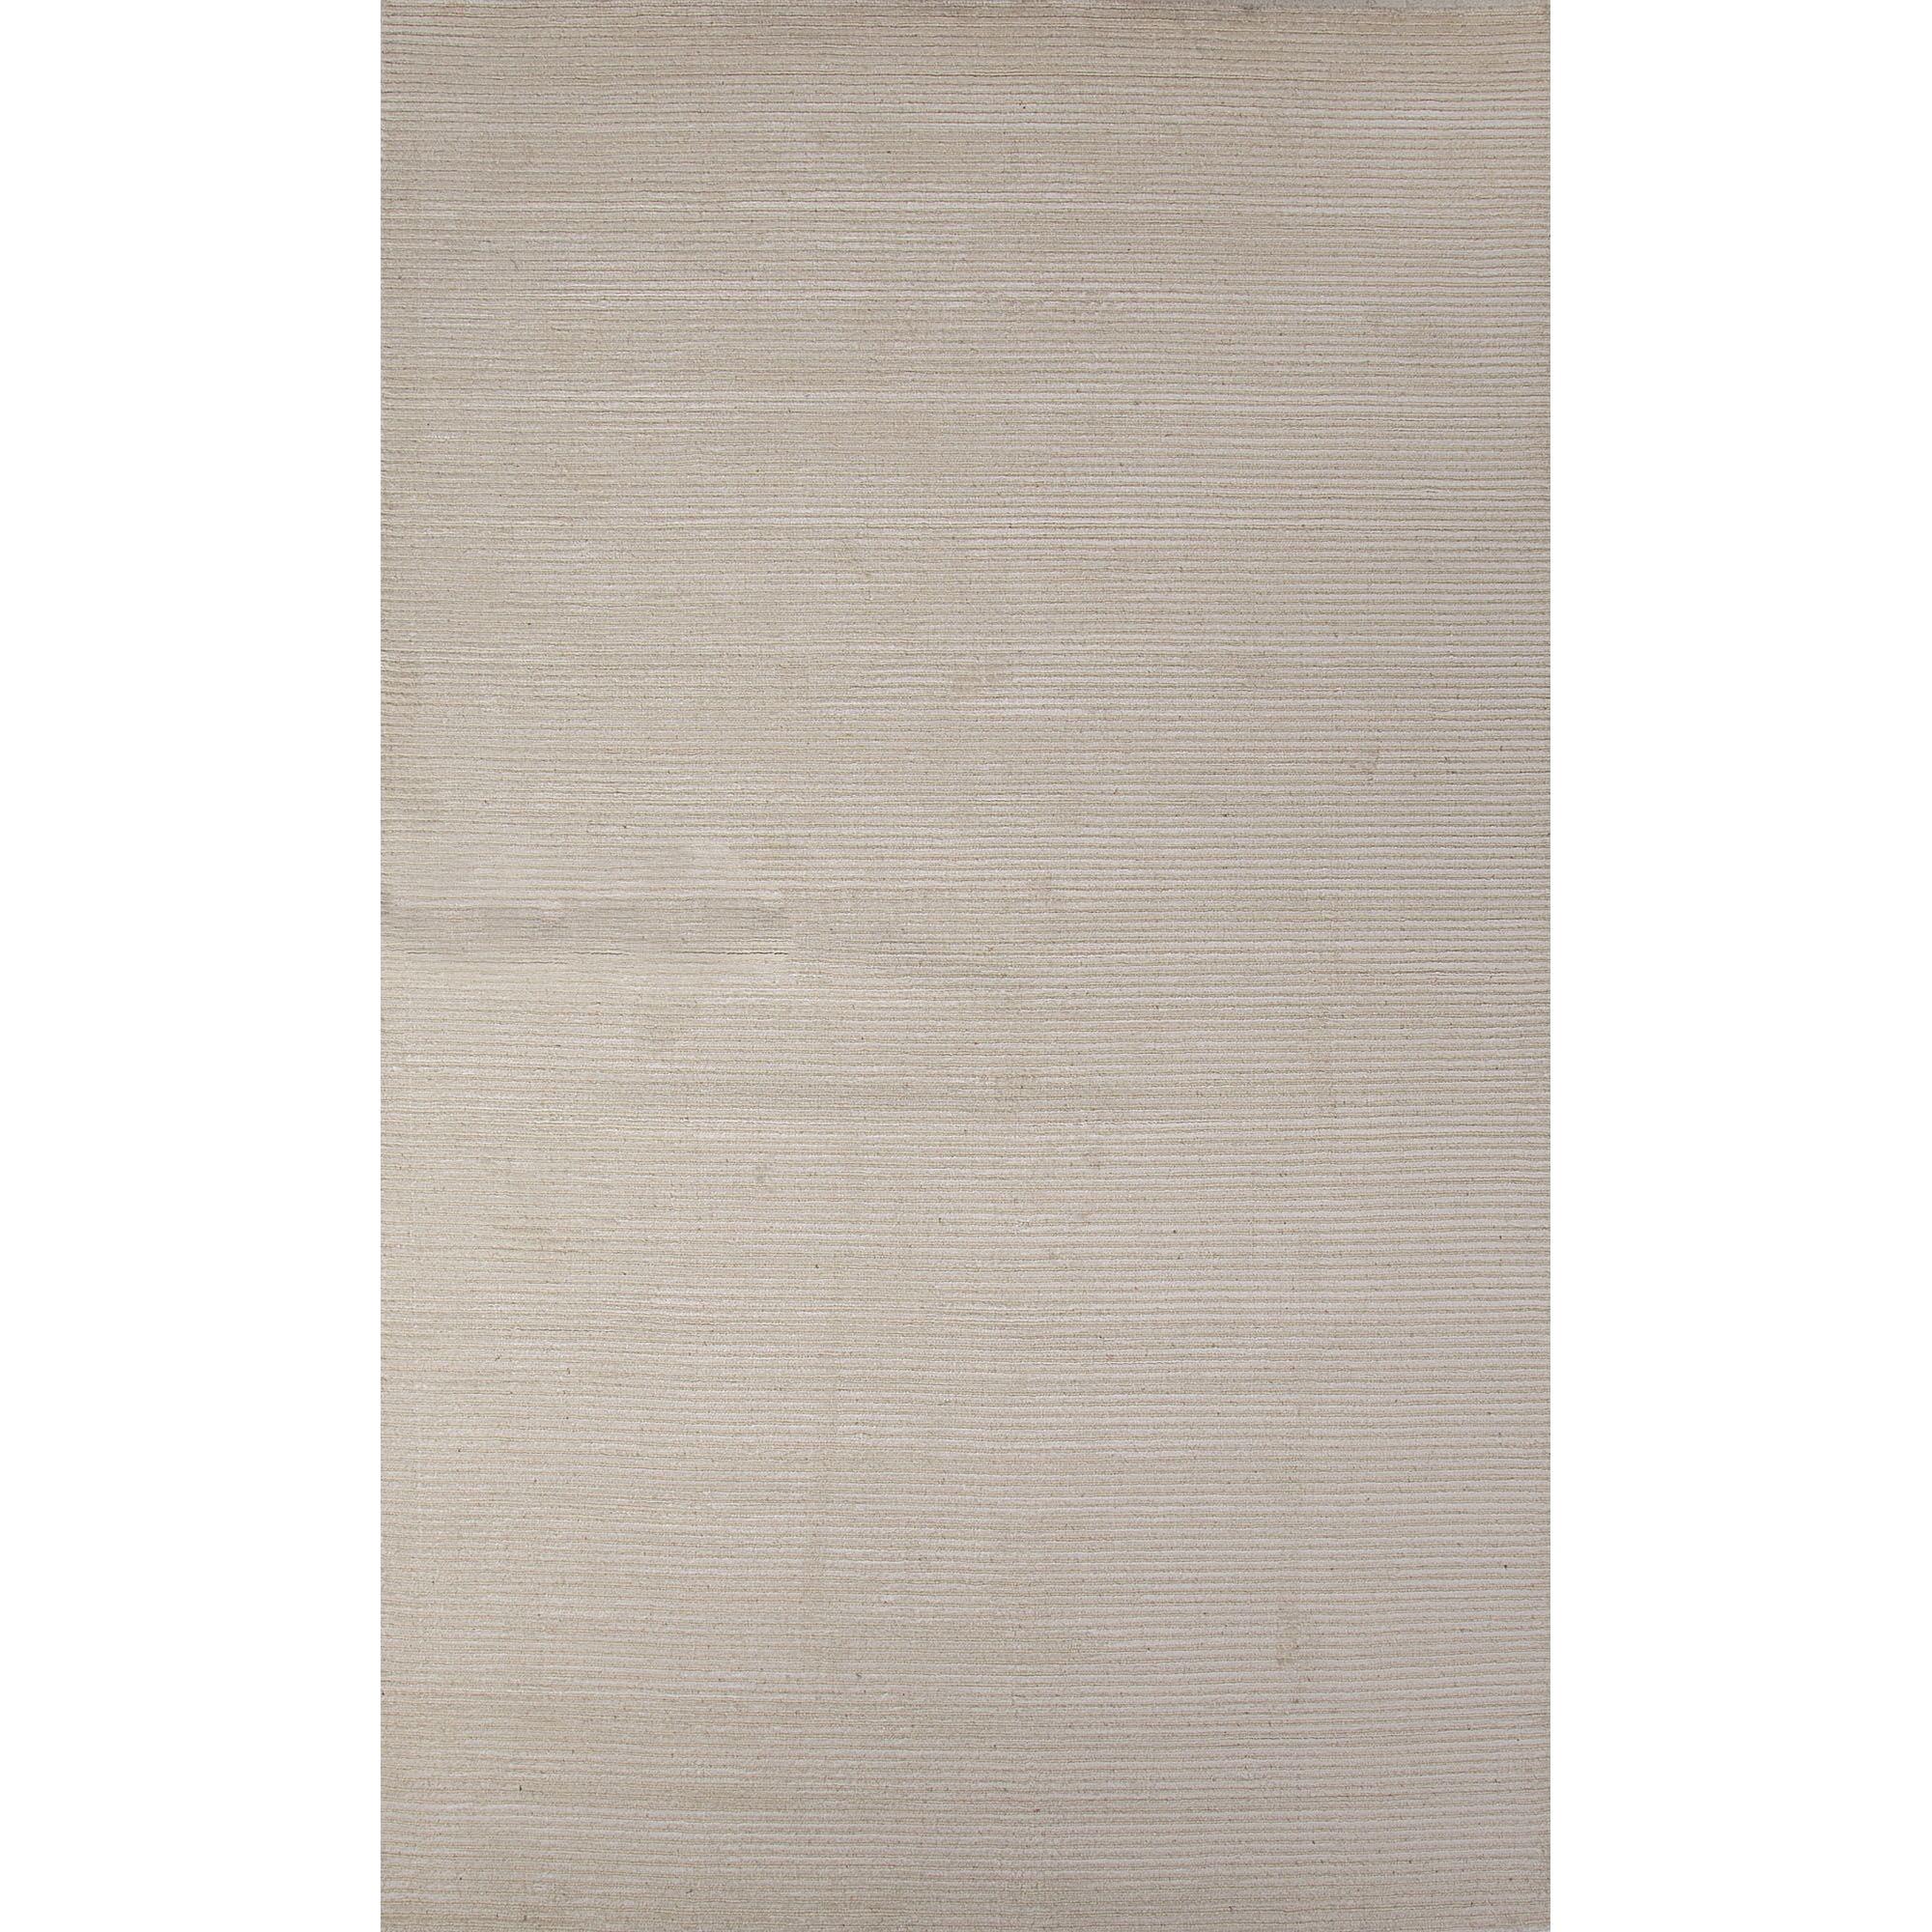 Quinones Wool and Art Silk Solids/Handloom Gray Area Rug Rug Size: Rectangle 5' x 8'